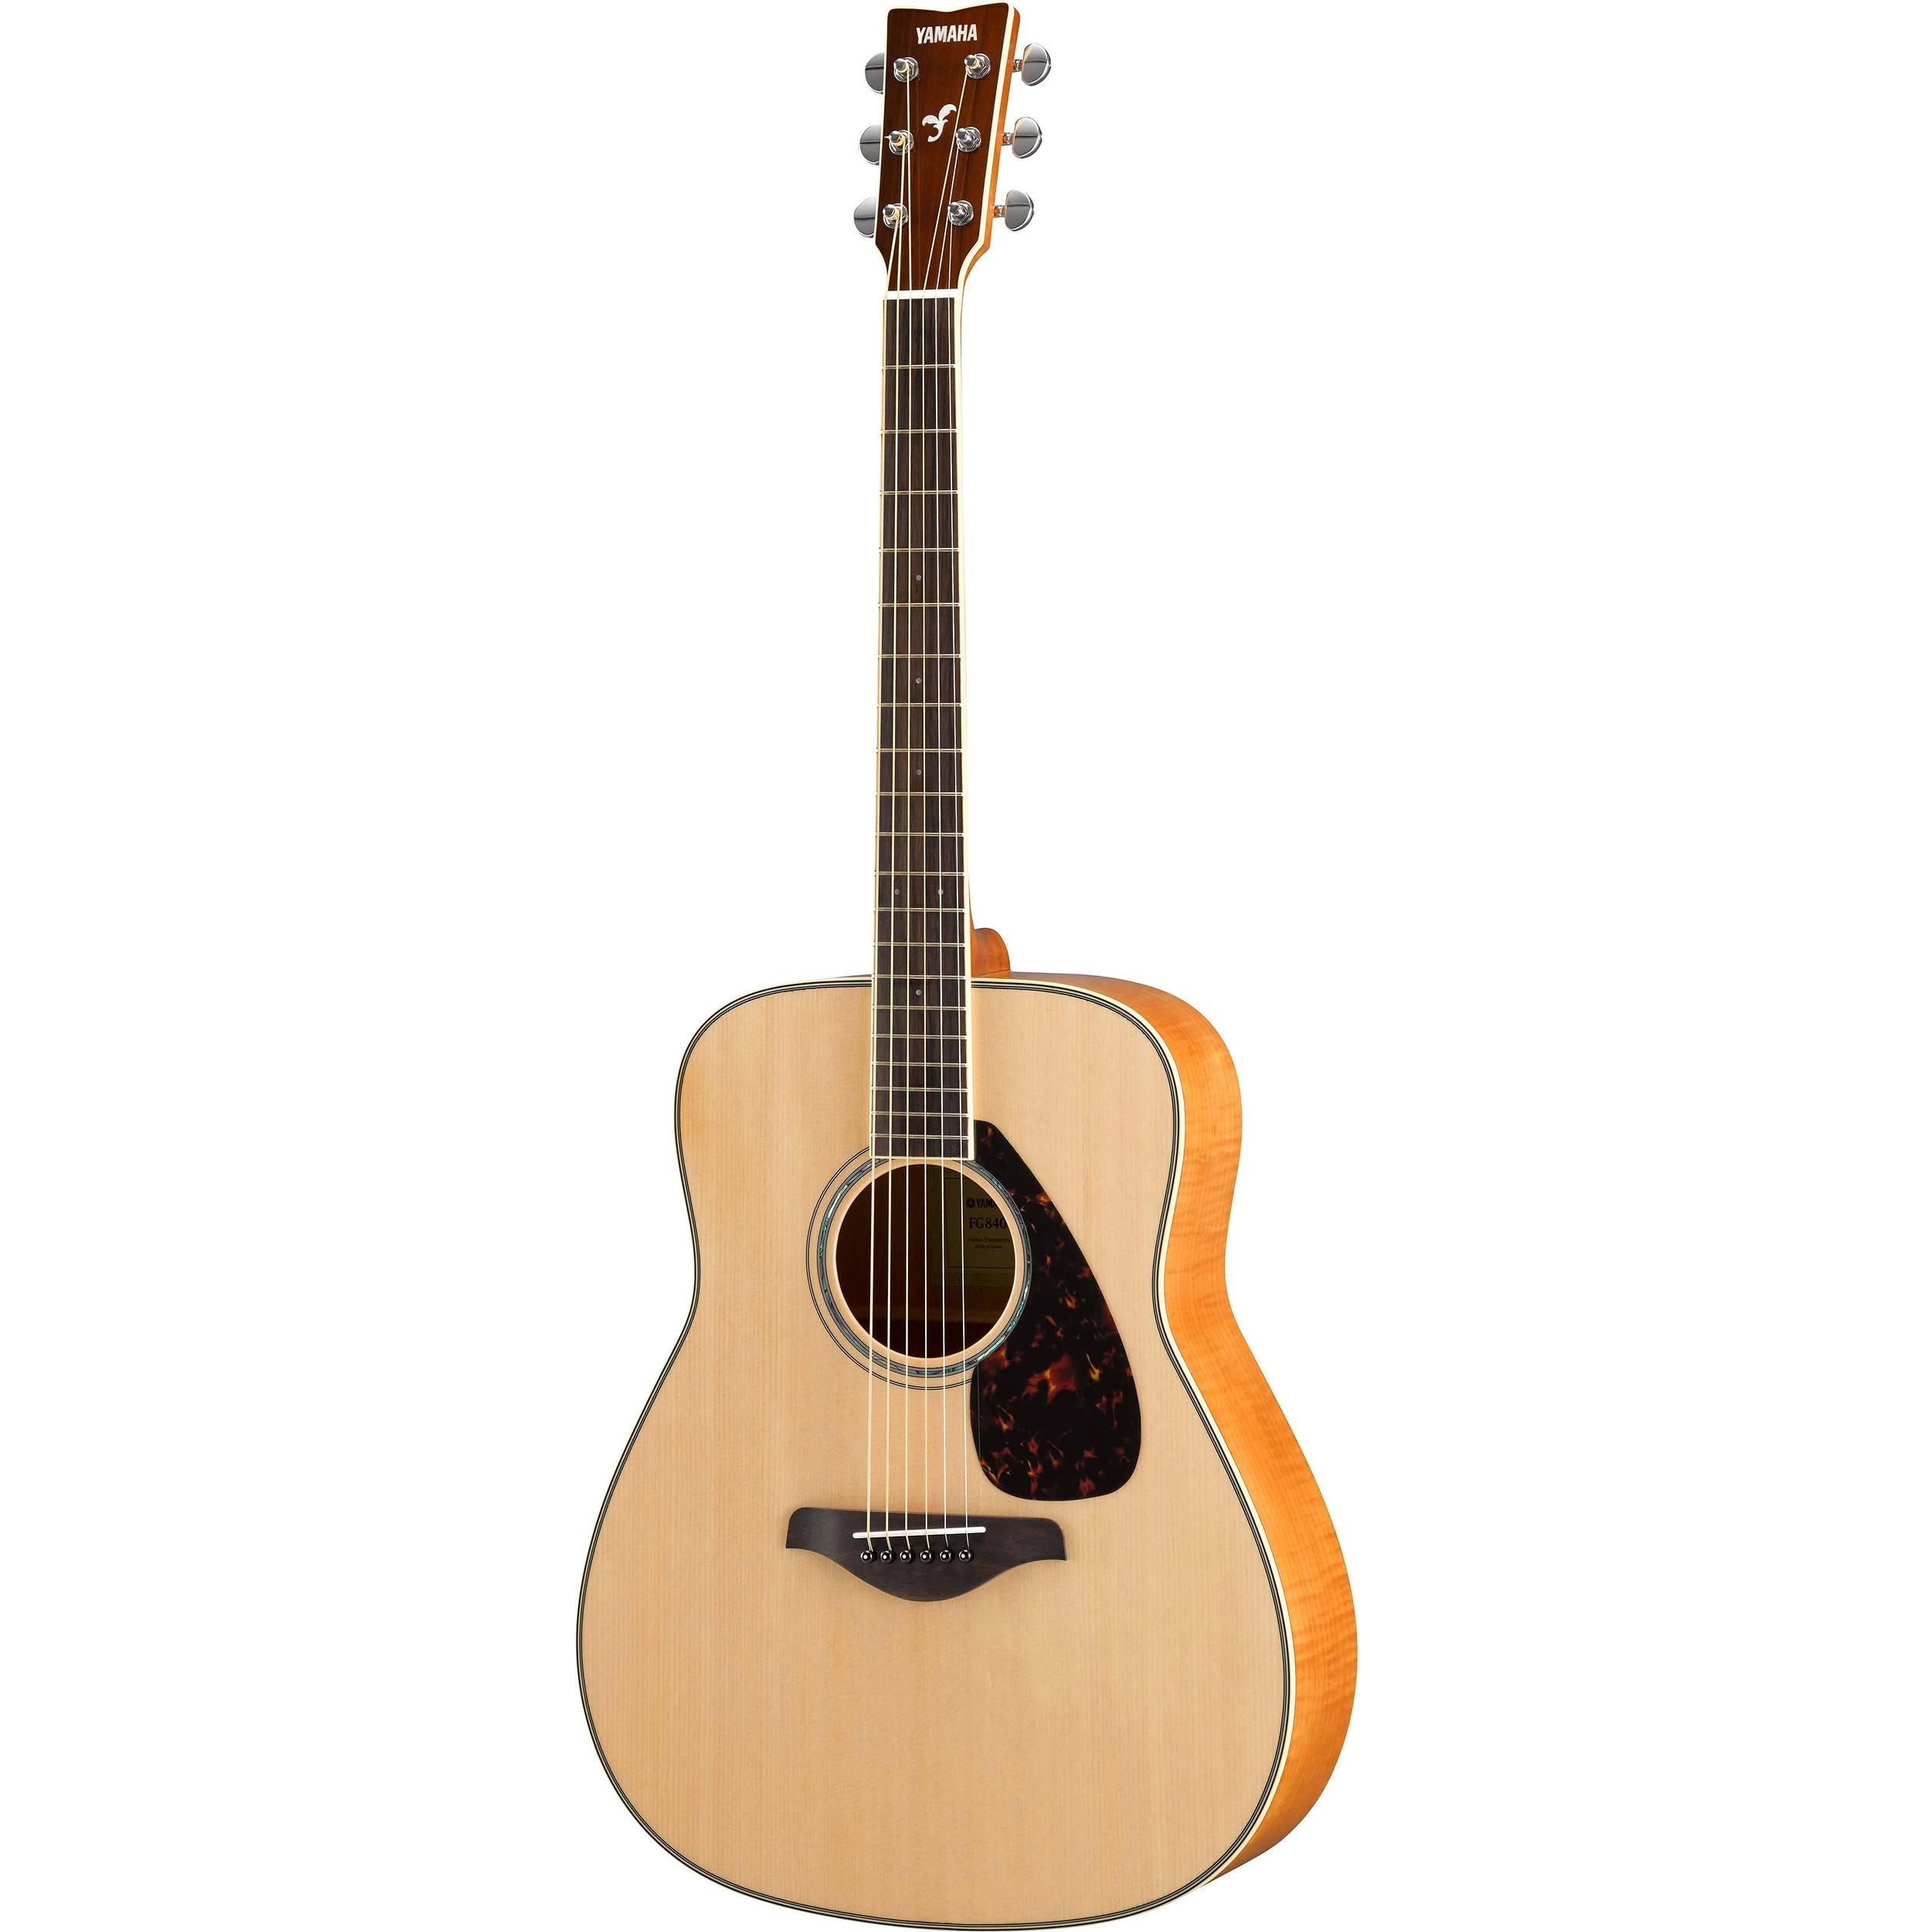 Yamaha fg840 fg series dreadnought style acoustic guitar fg840 for Yamaha series a